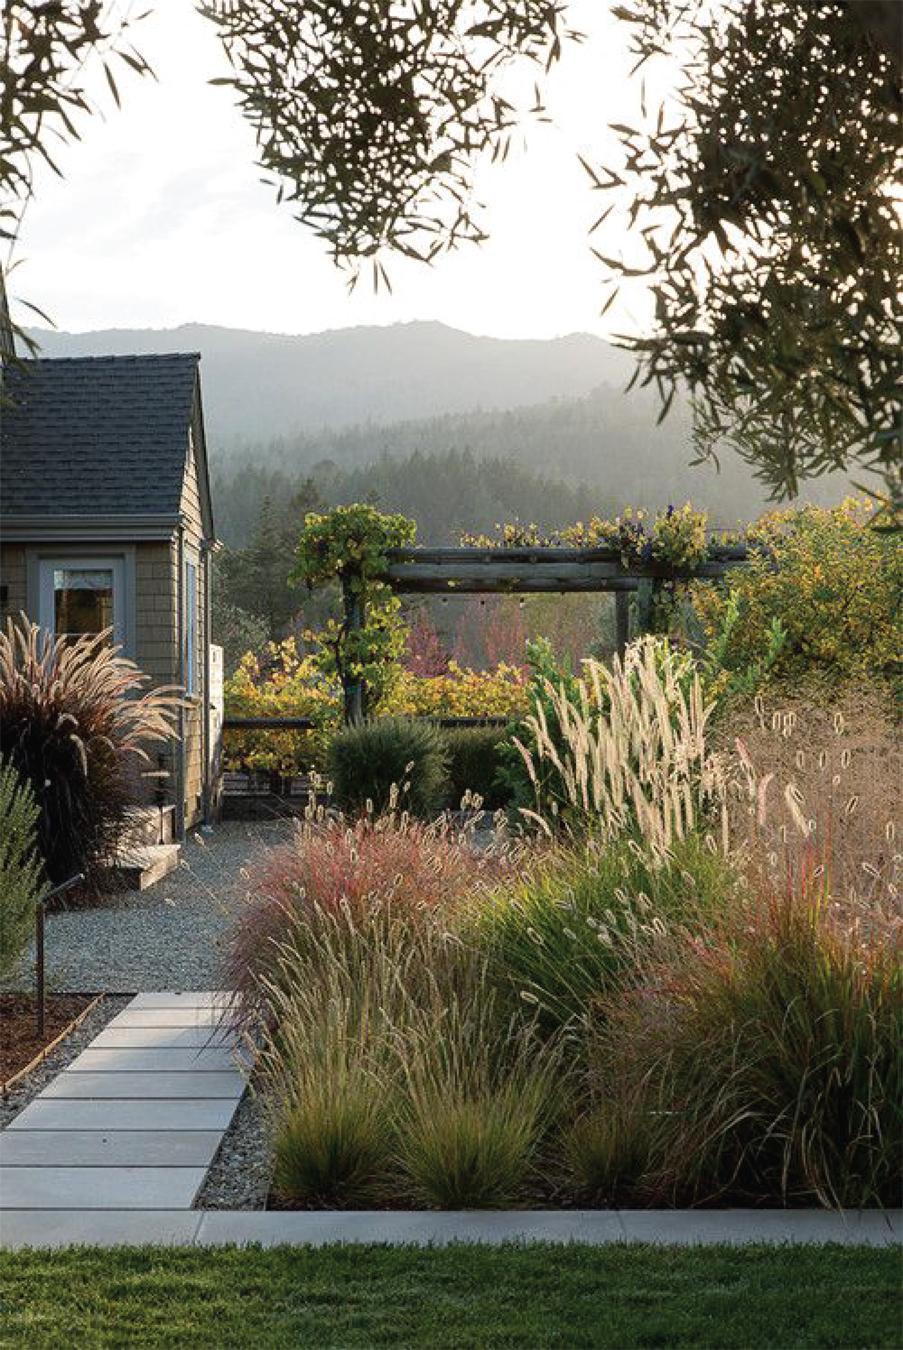 Statement Gardens: tall grassy landscapes with concrete paver walkways | Akin Design Studio Blog